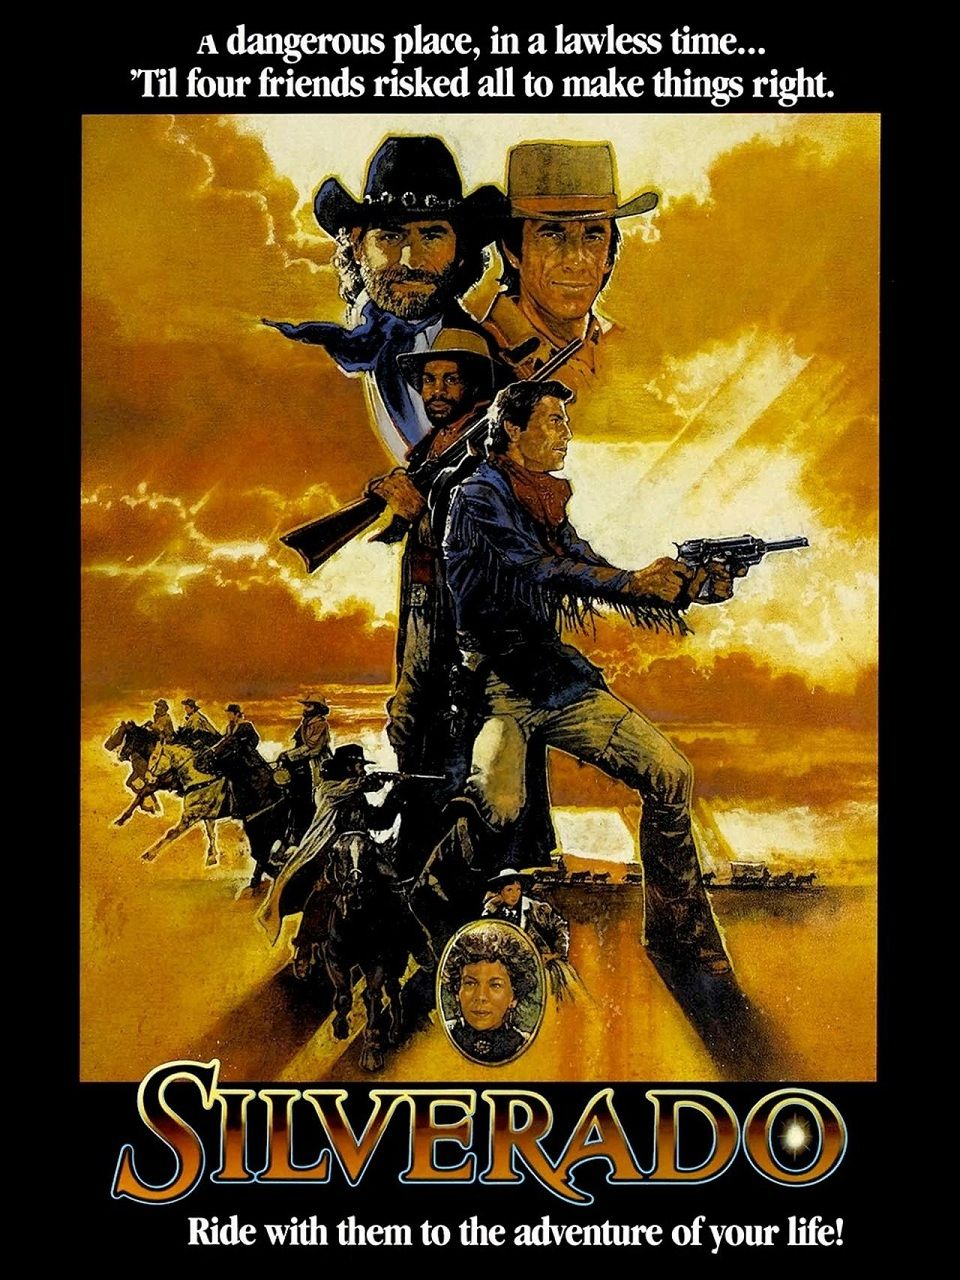 Silverado (1985) HDTV | clasicofilm / cine online